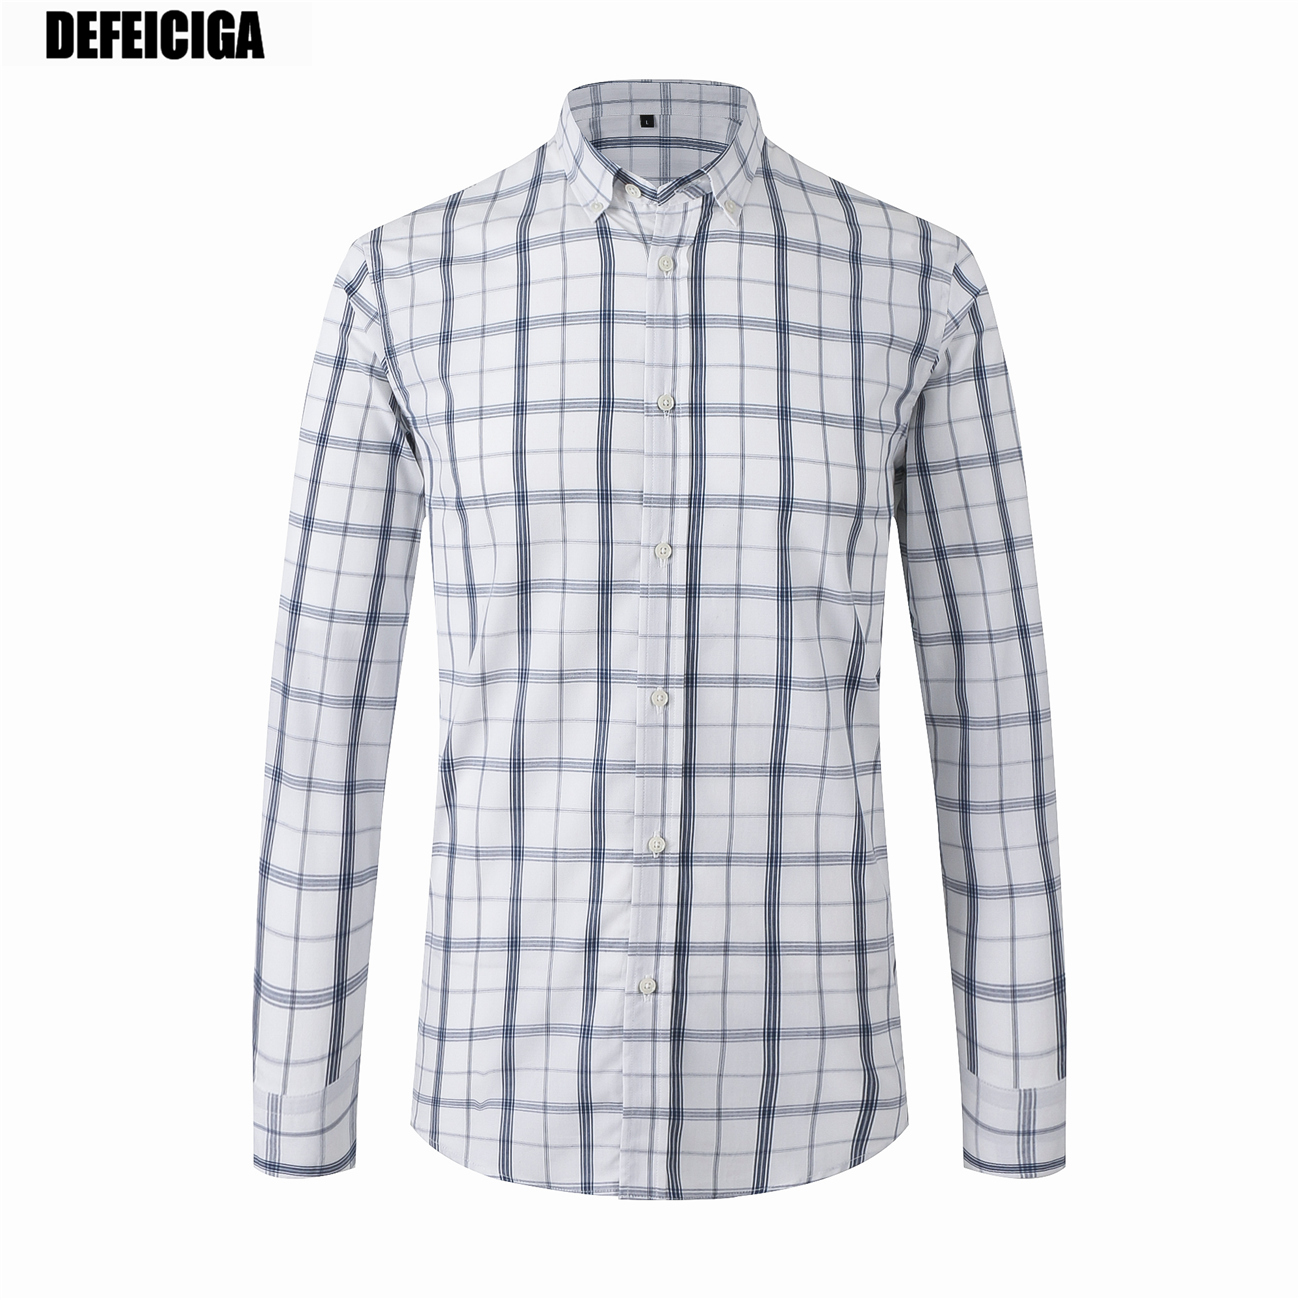 2019 DEFEICIGA Causal Social Formal Shirt Men Long Sleeve plaid Business Office Male Cotton Mens Dress shirts 015